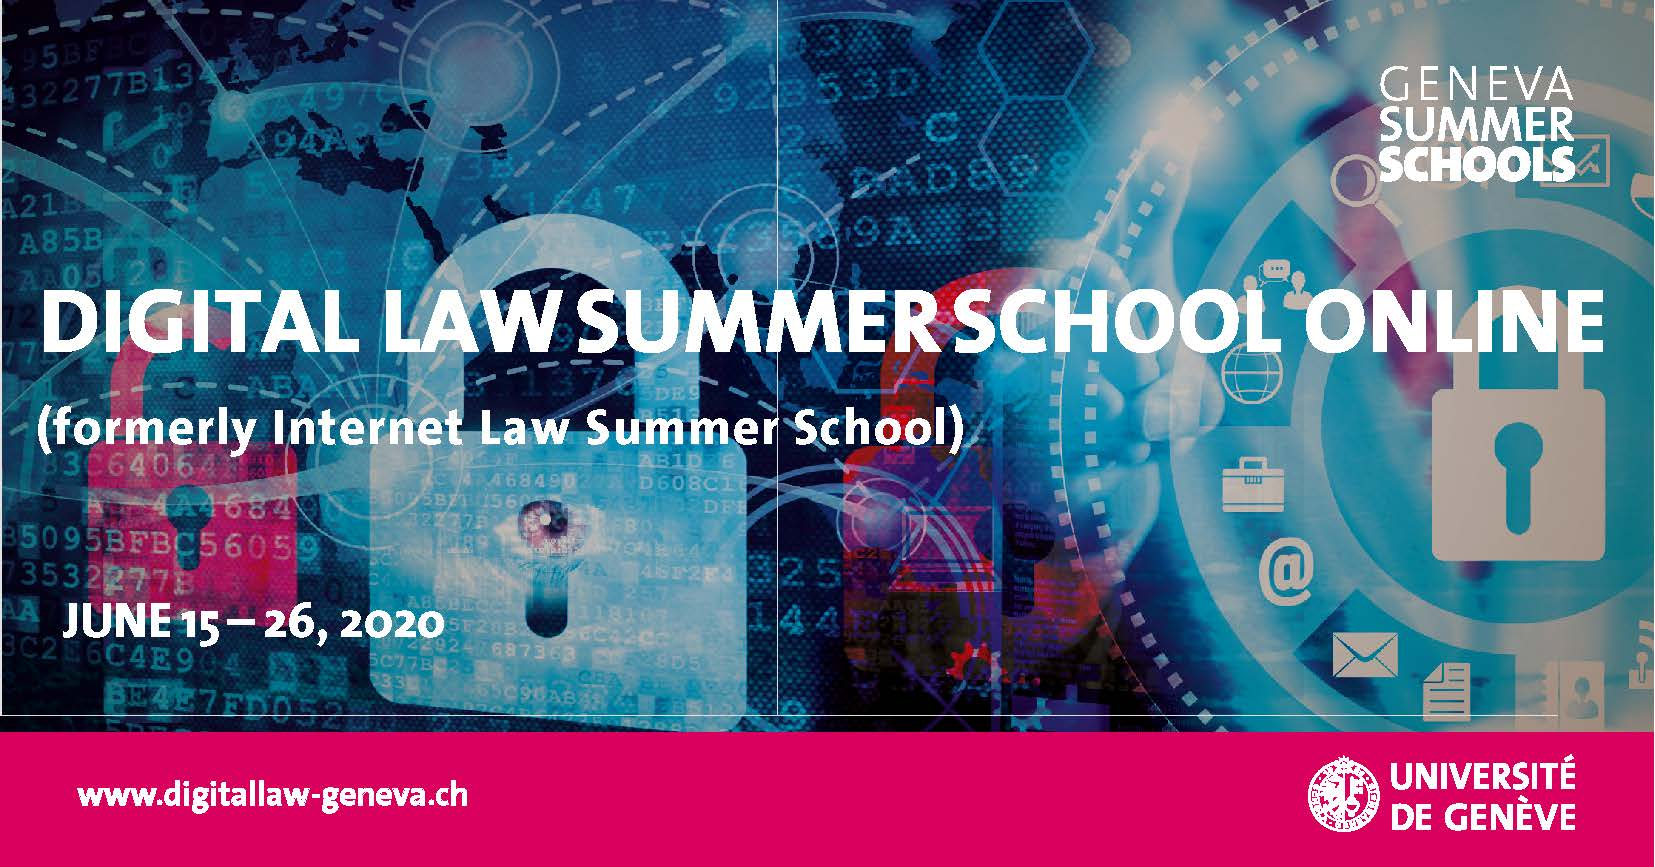 Geneva Summer Schools • Digital Law With Georgia State Summer School Schedule